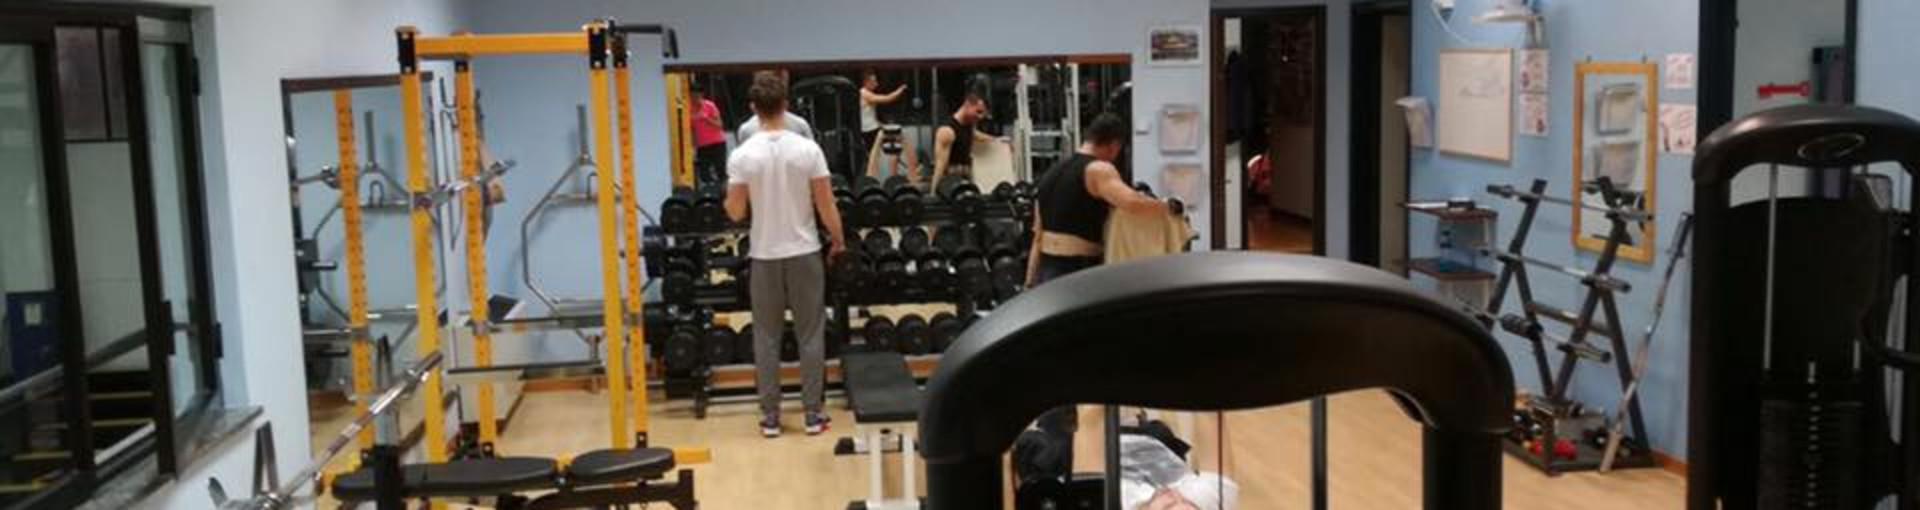 TM Gym Fitness - Suno